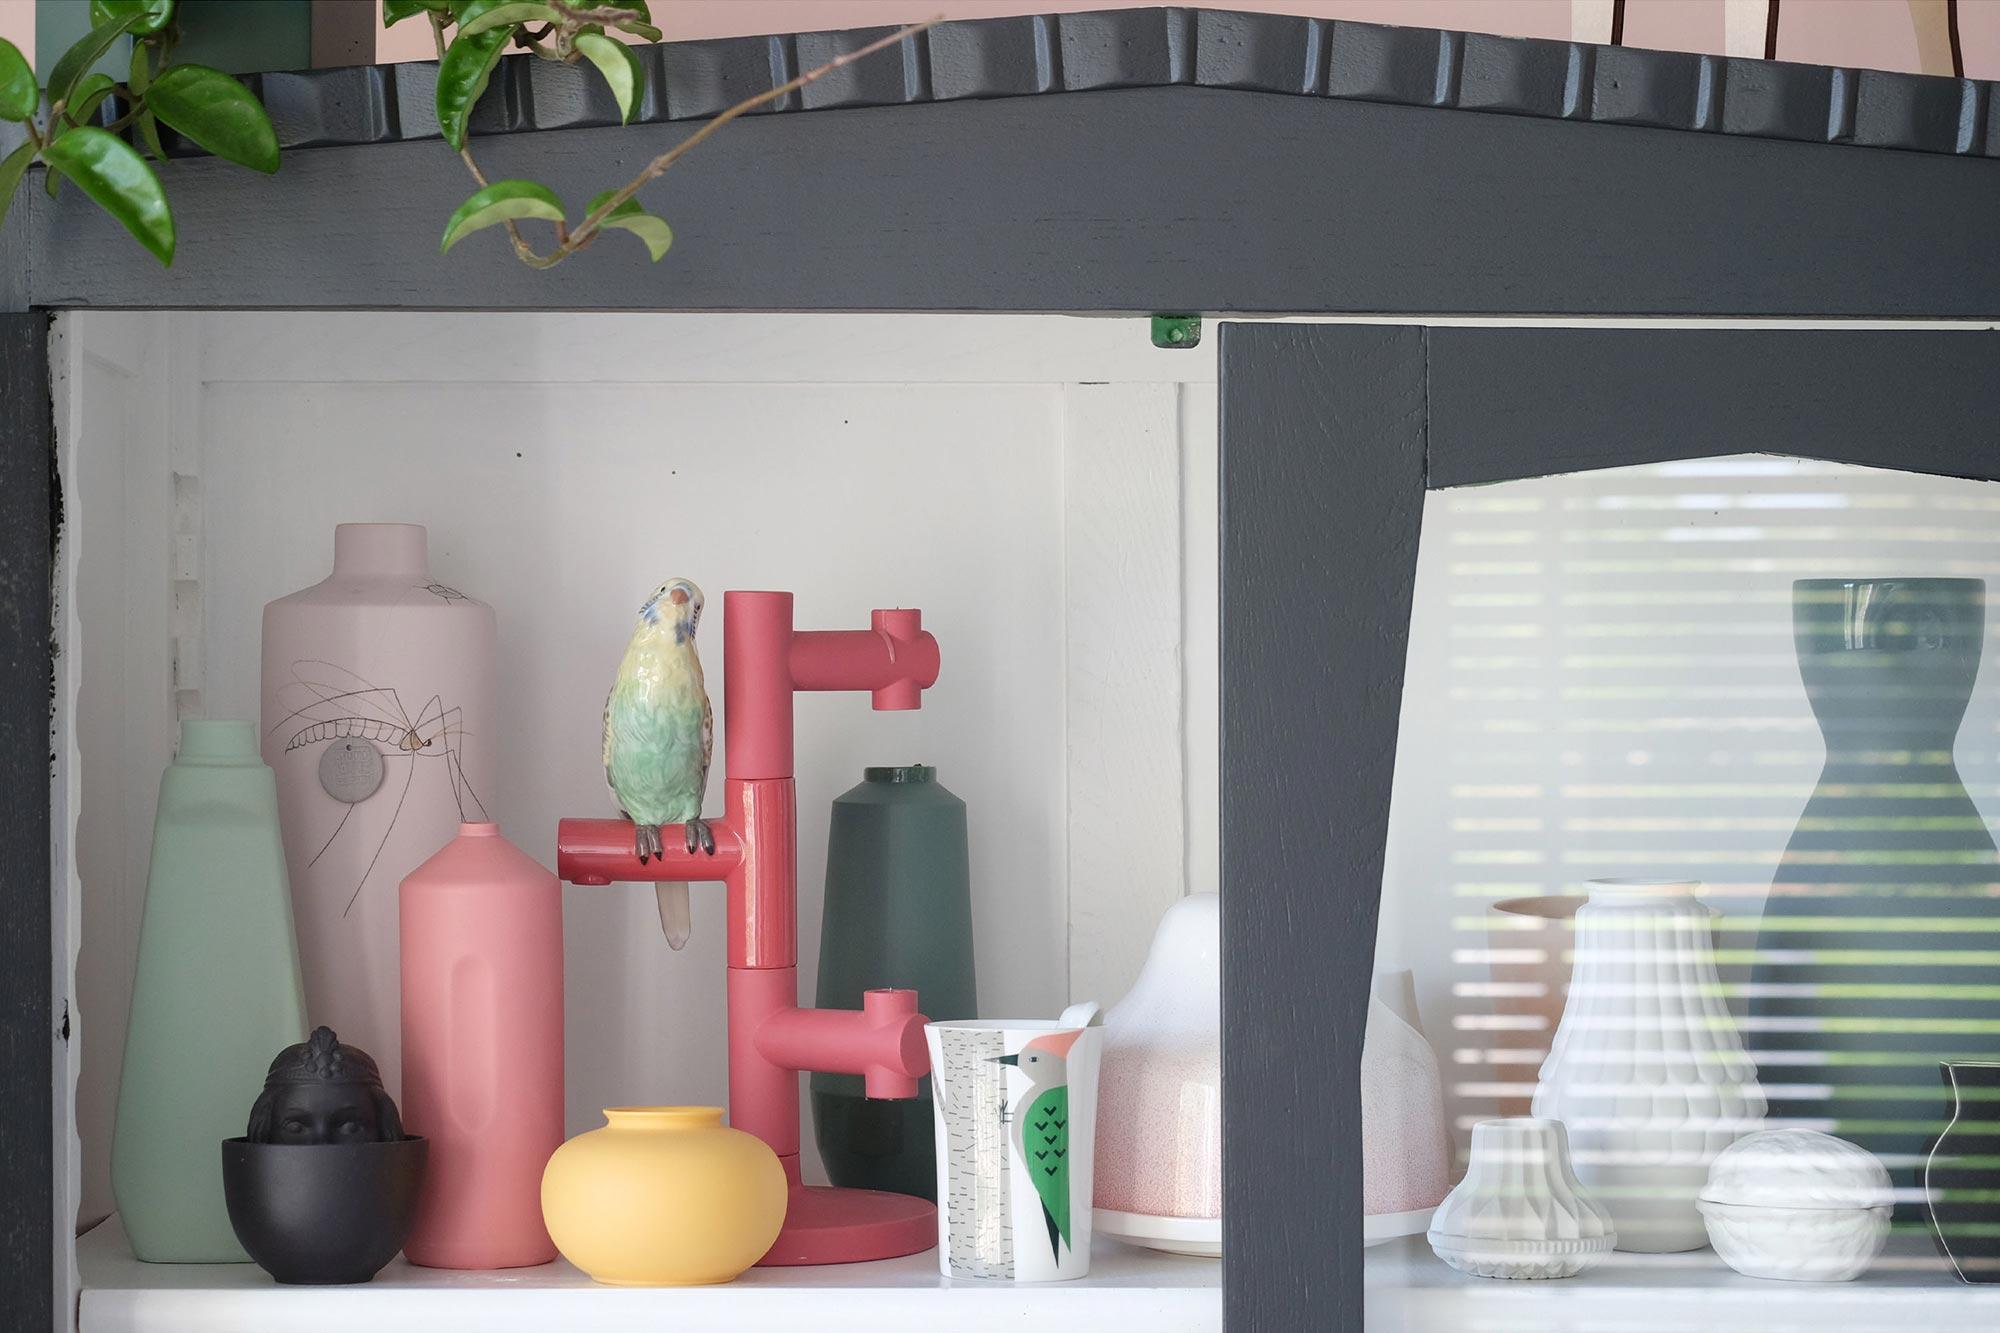 Roze kandelaar Jaime Hayon met PRCHTG